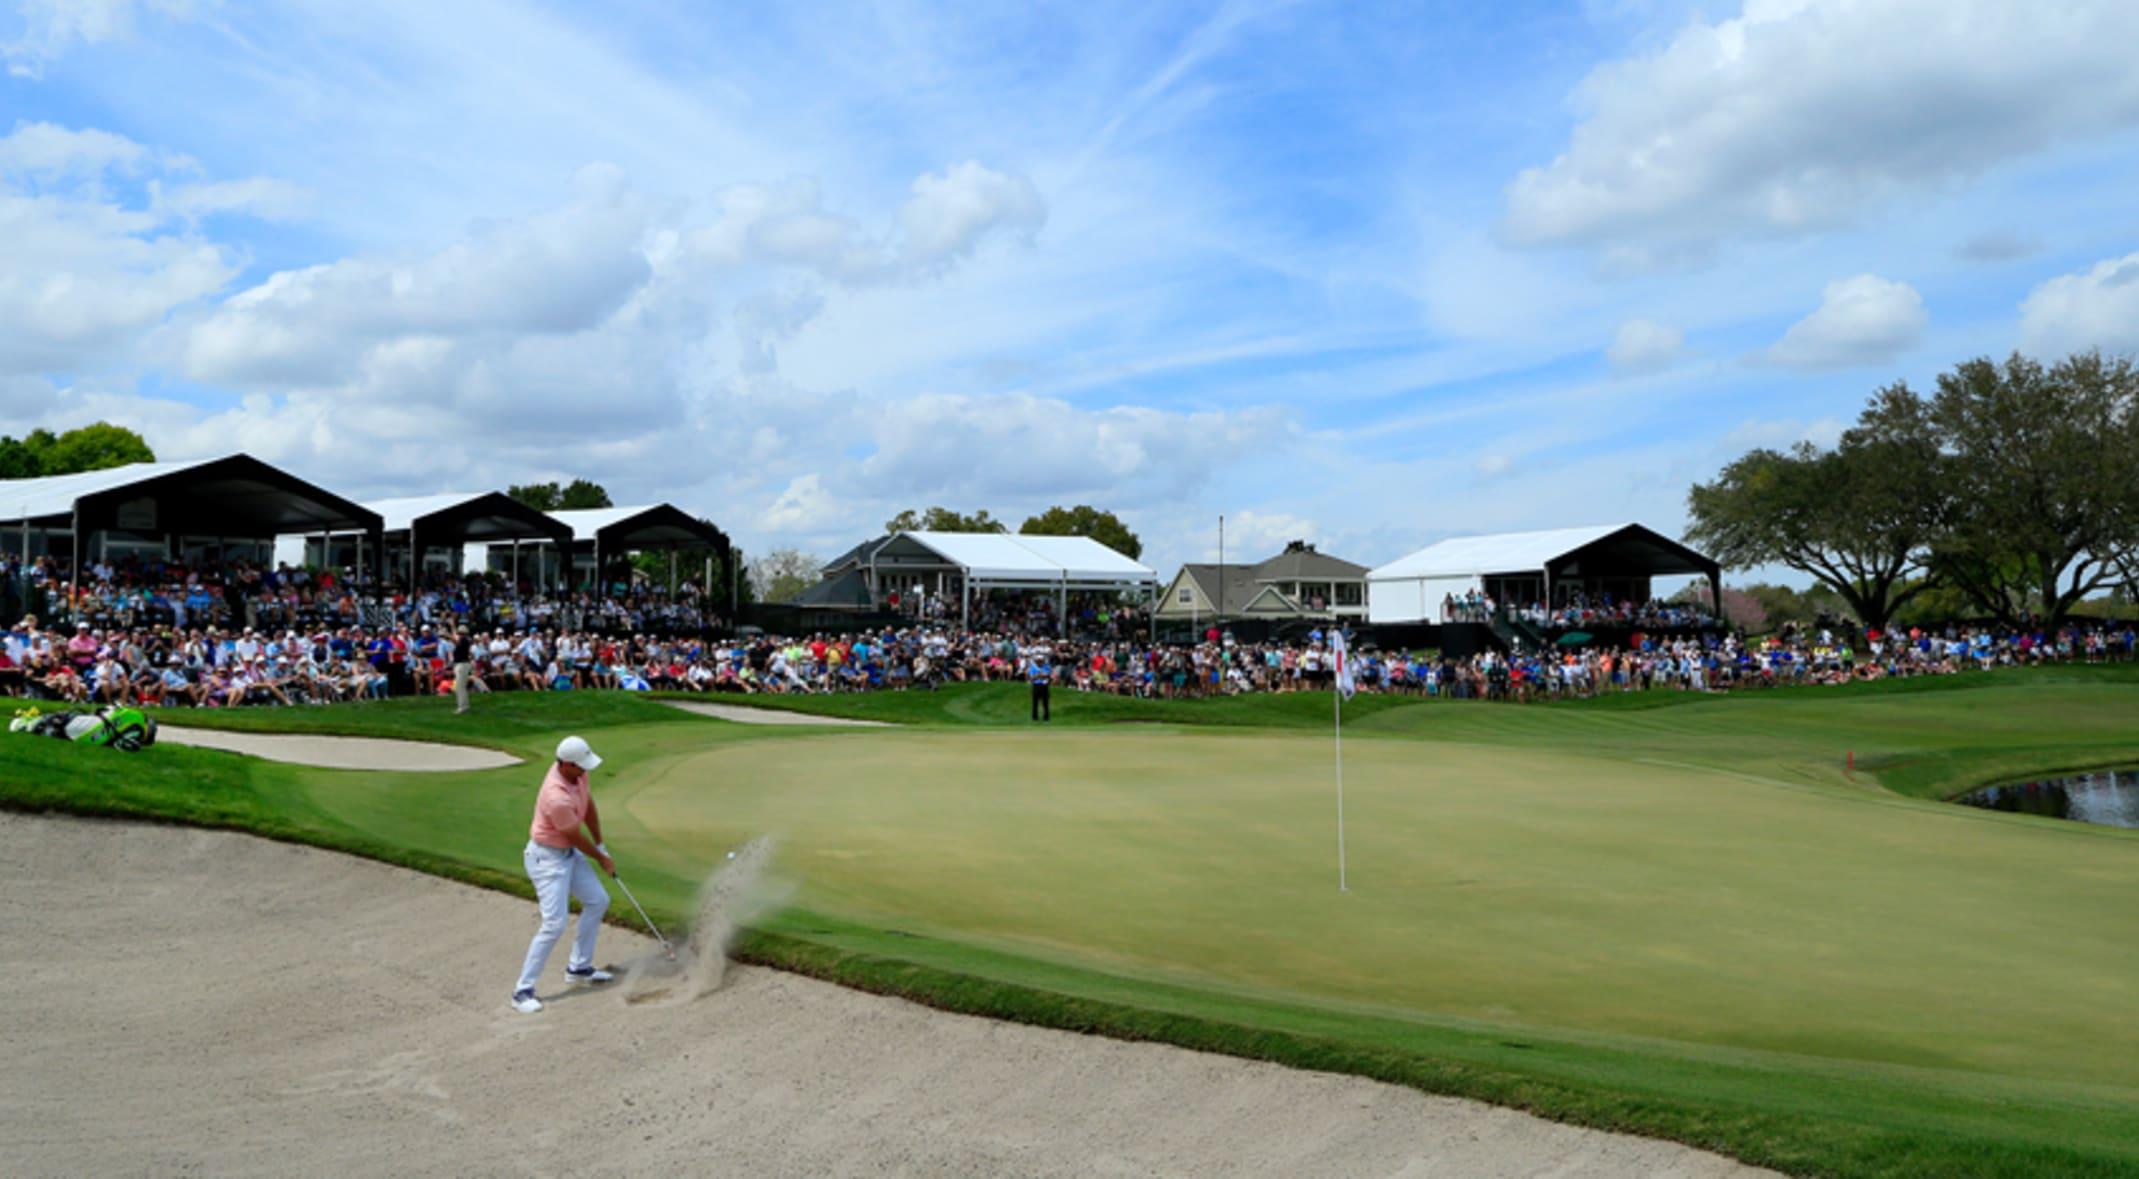 30+ Arnold palmer invitational golf tournament scores viral